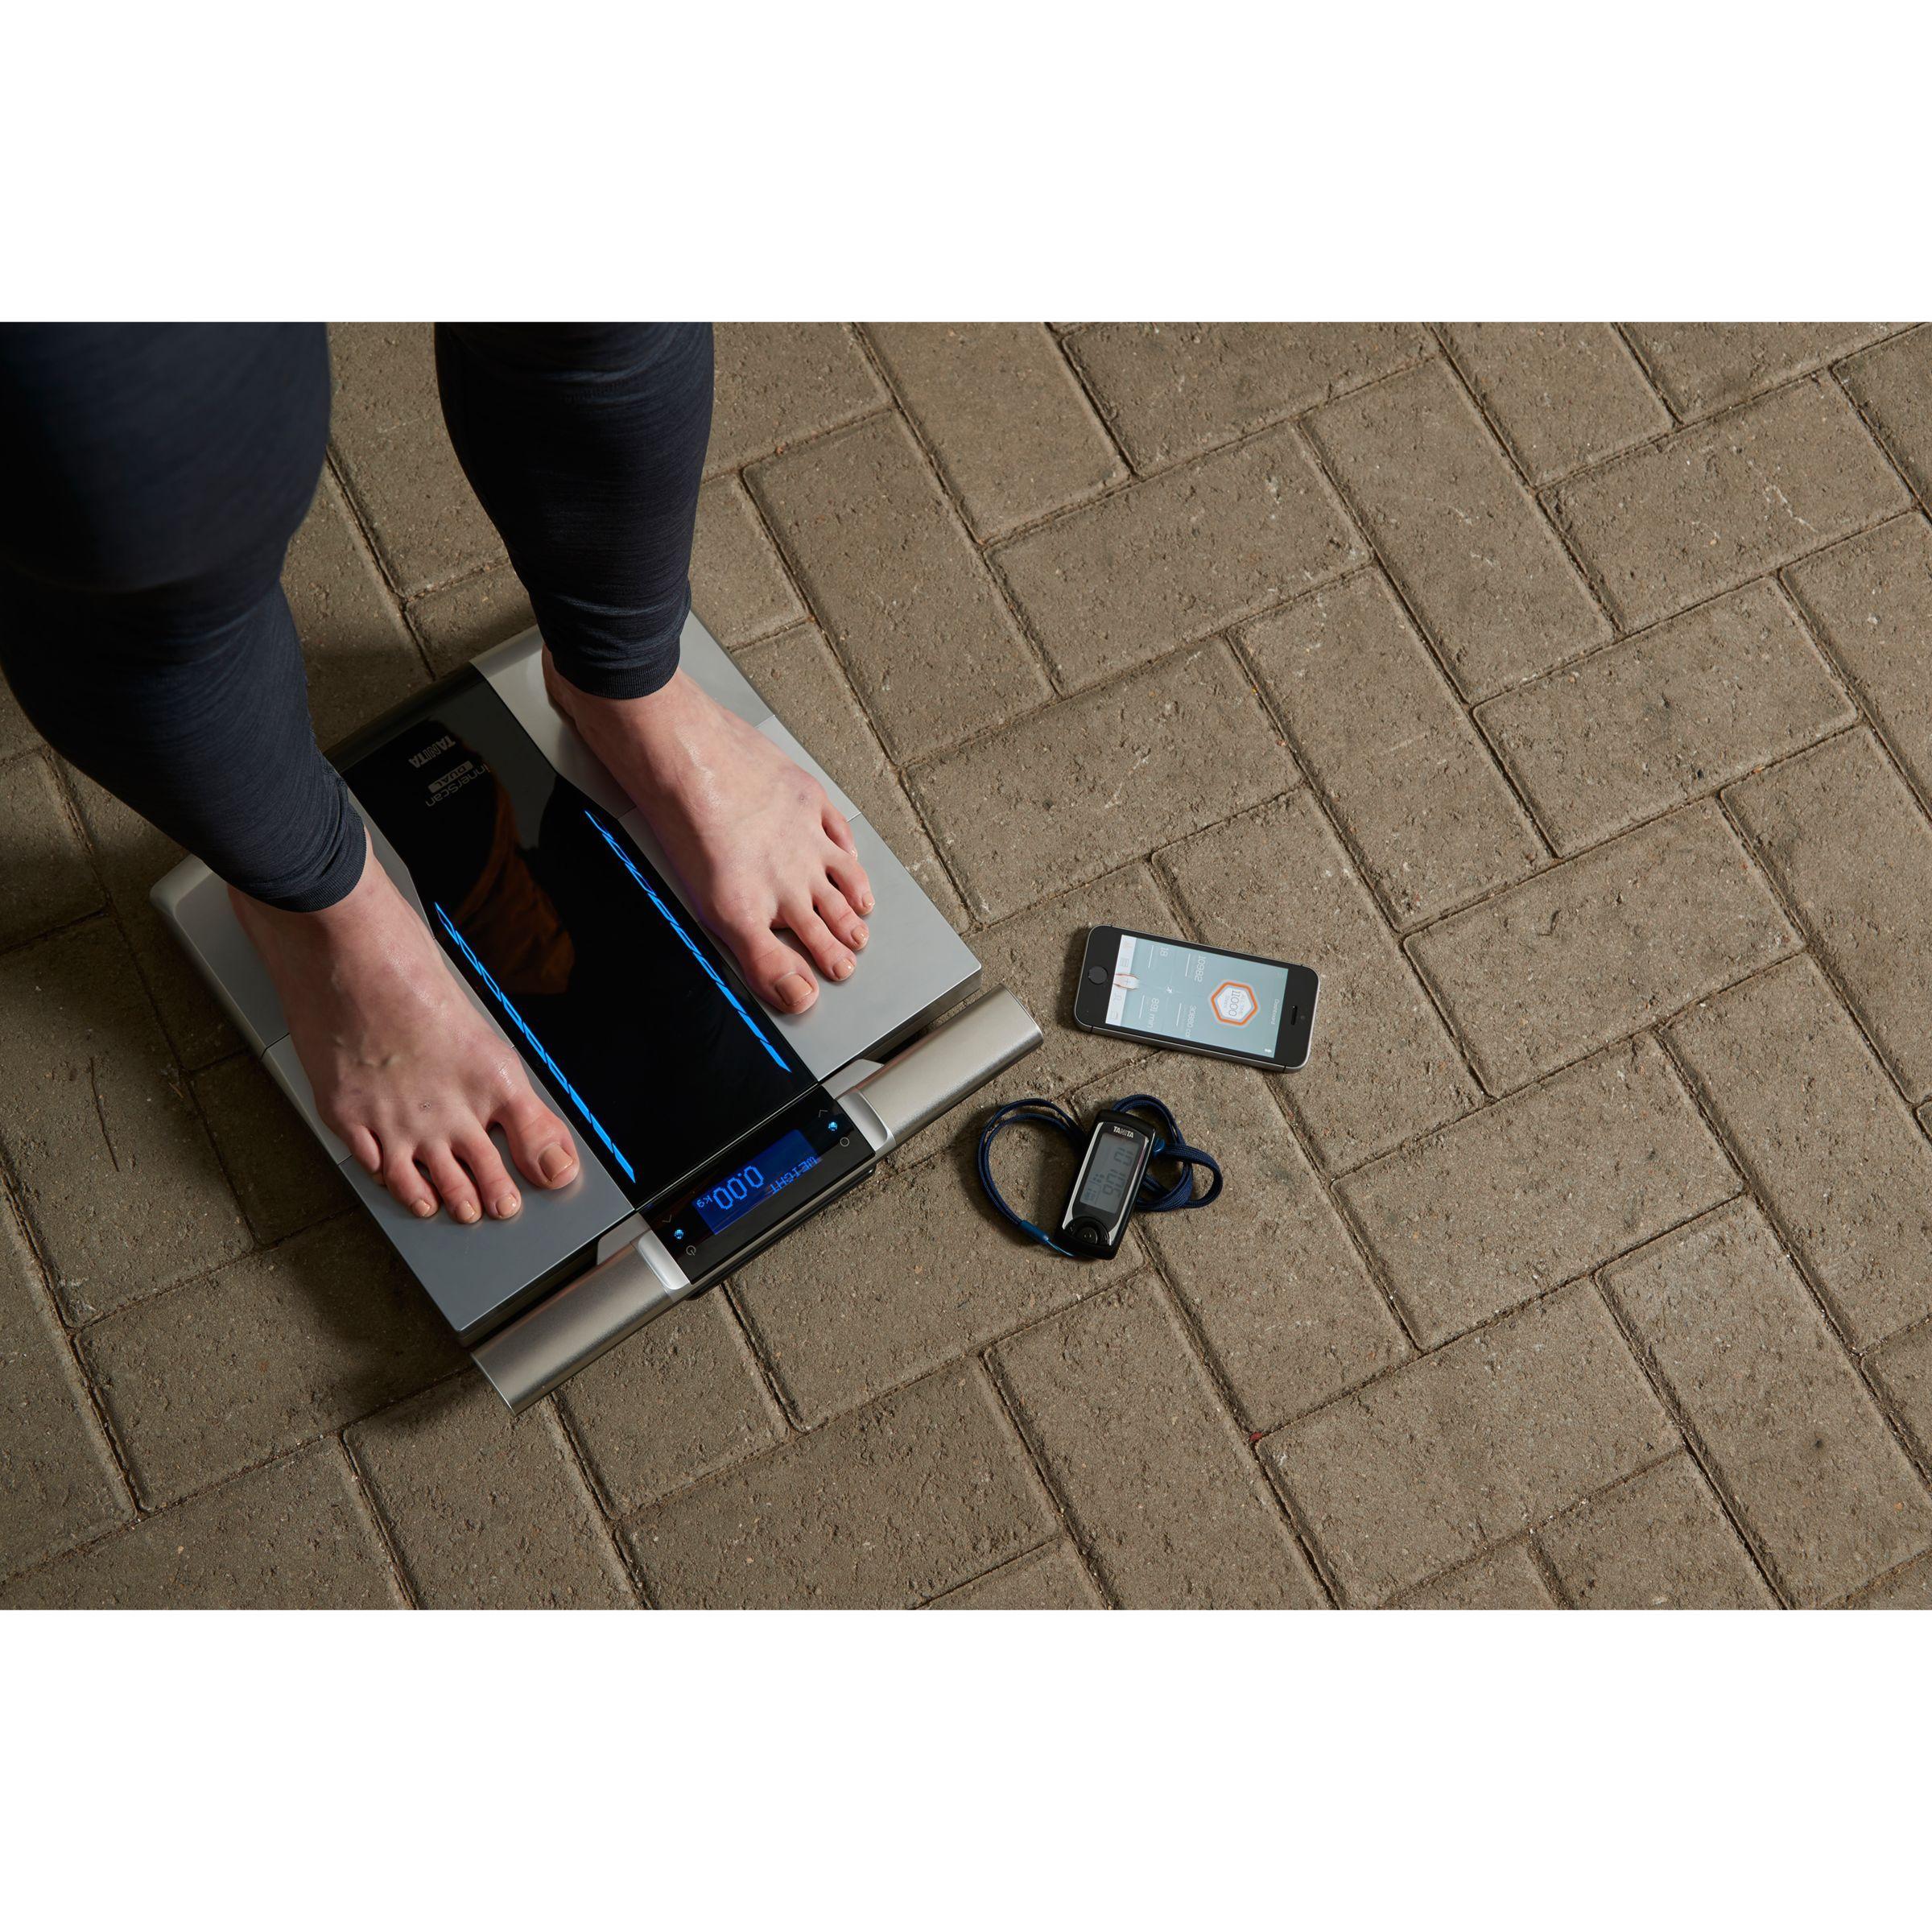 Tanita Rd 545 Connected Segmental Body Composition Monitor